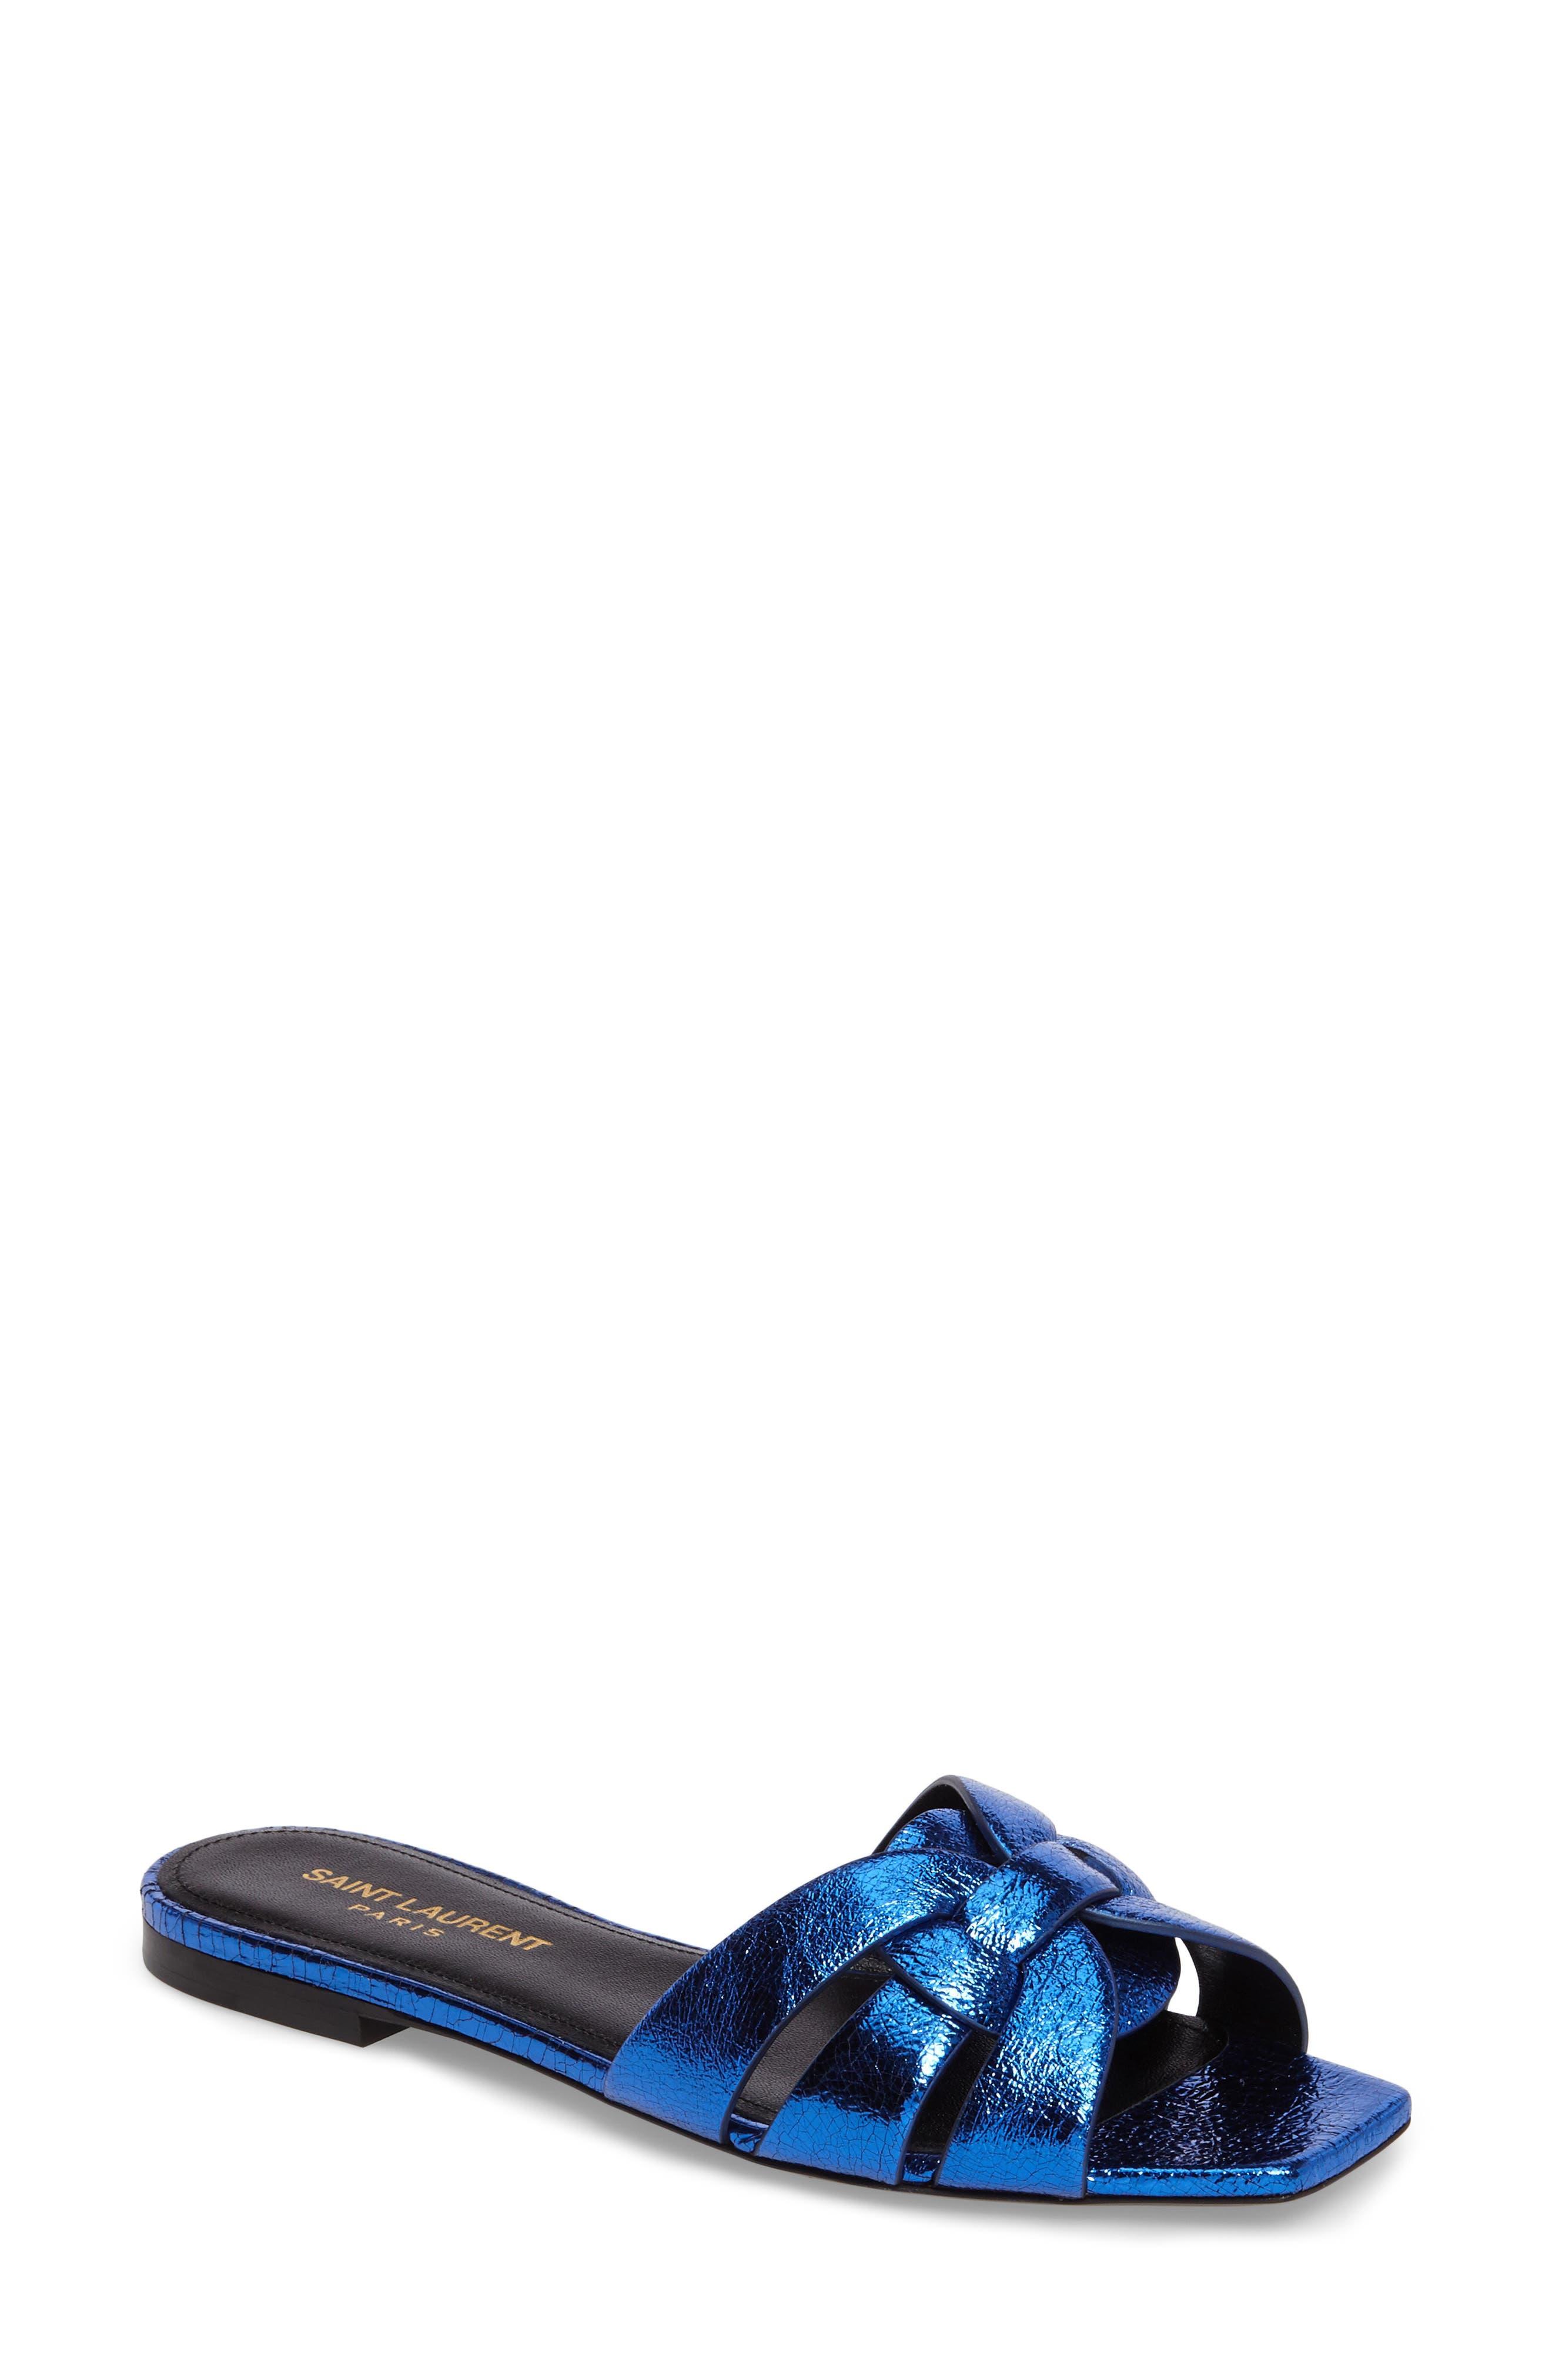 Pieds Metallic Slide Sandal,                         Main,                         color, 450